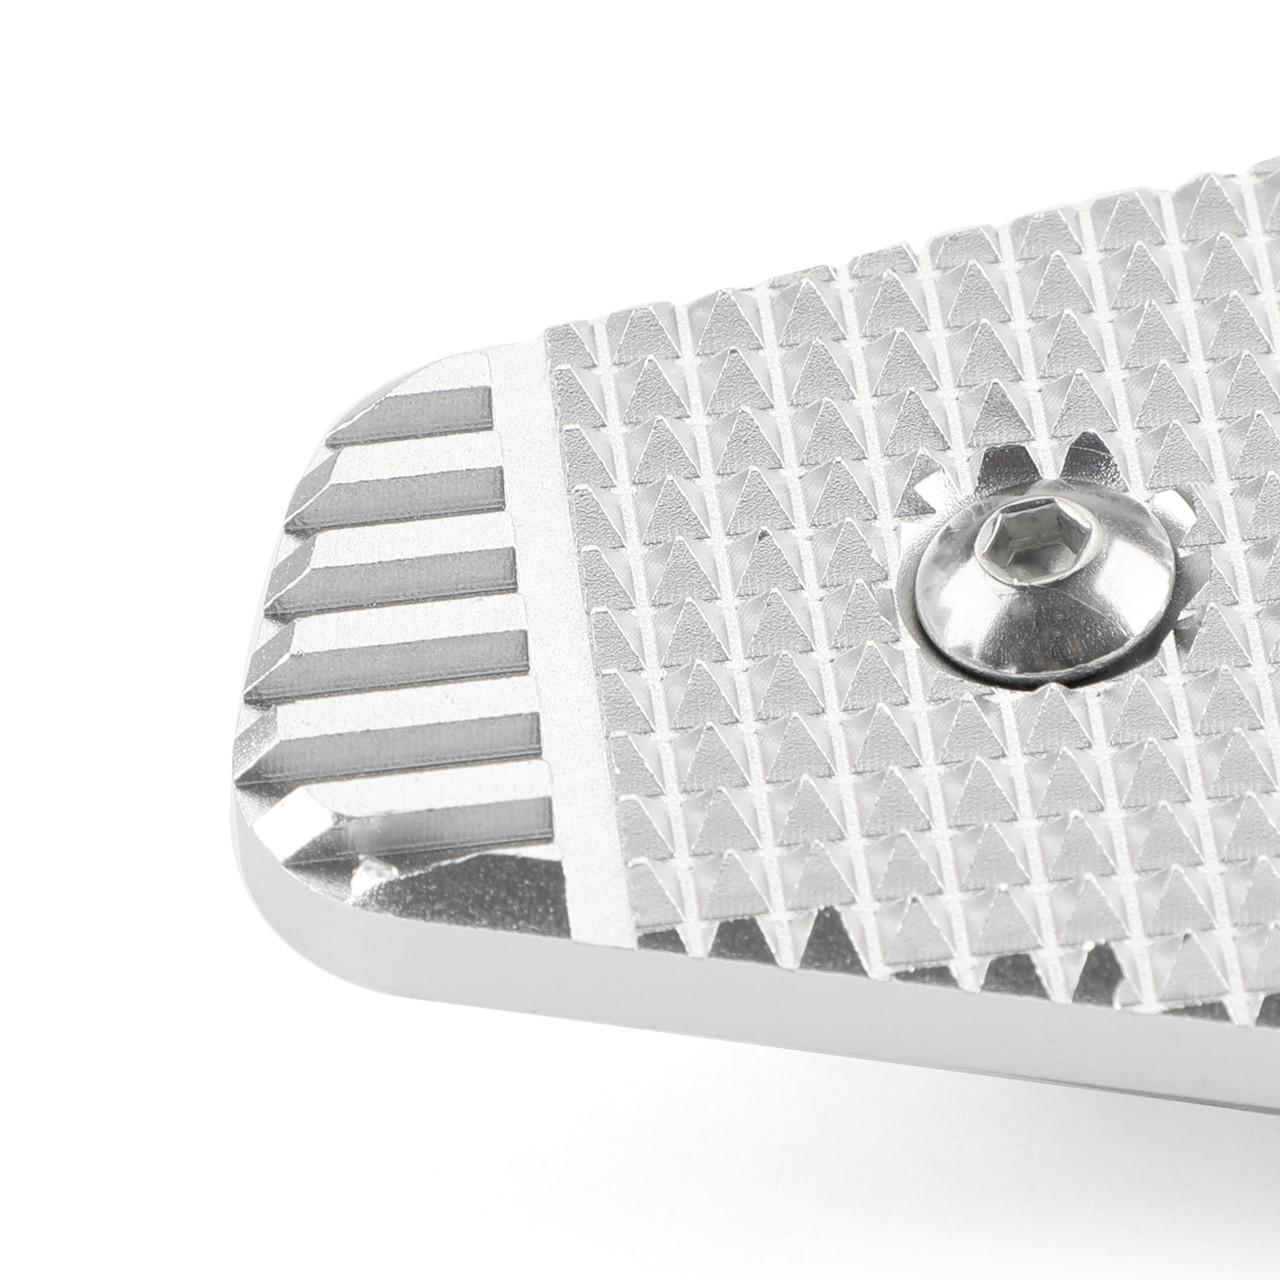 Rear Foot Brake Lever Pedal Extension Enlarge Pad Extender Fit For BMW R nineT Scrambler Urban 2017-2020 Silver